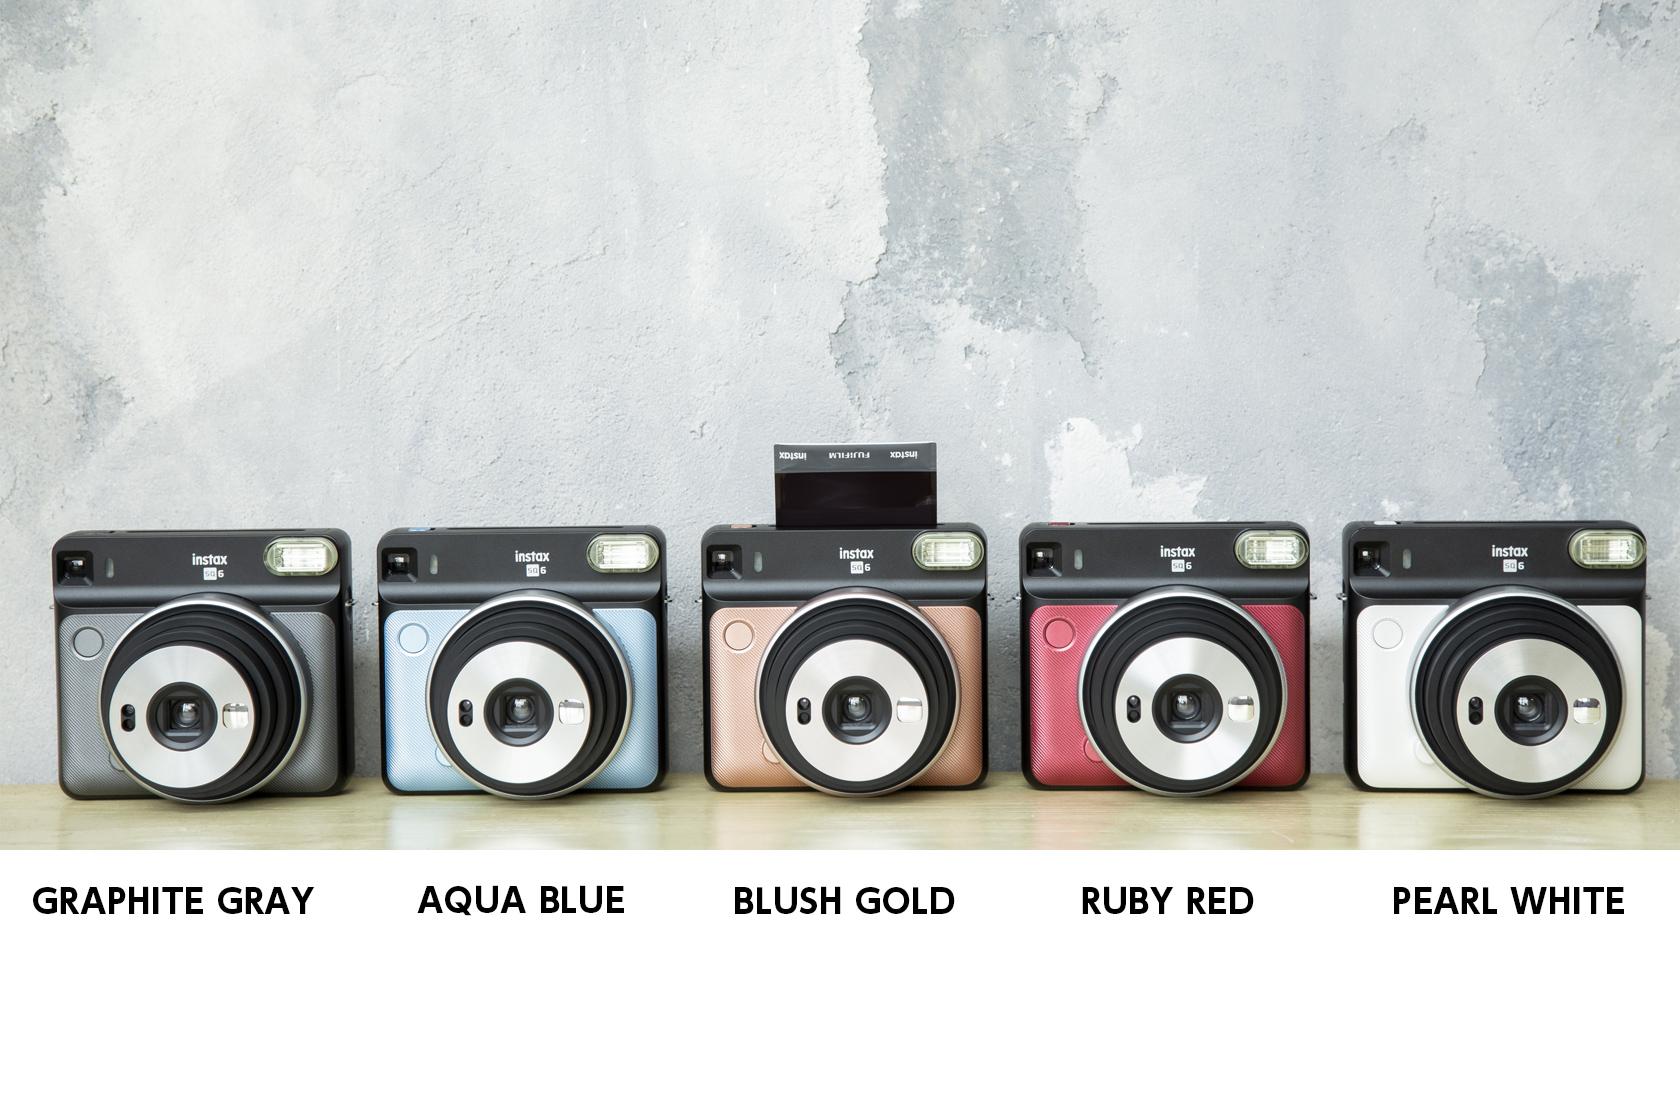 [photo] Instax SQUARE SQ6 in Graphite Black, Aqua Blue, Blush Gold, Ruby Red and Pearl White